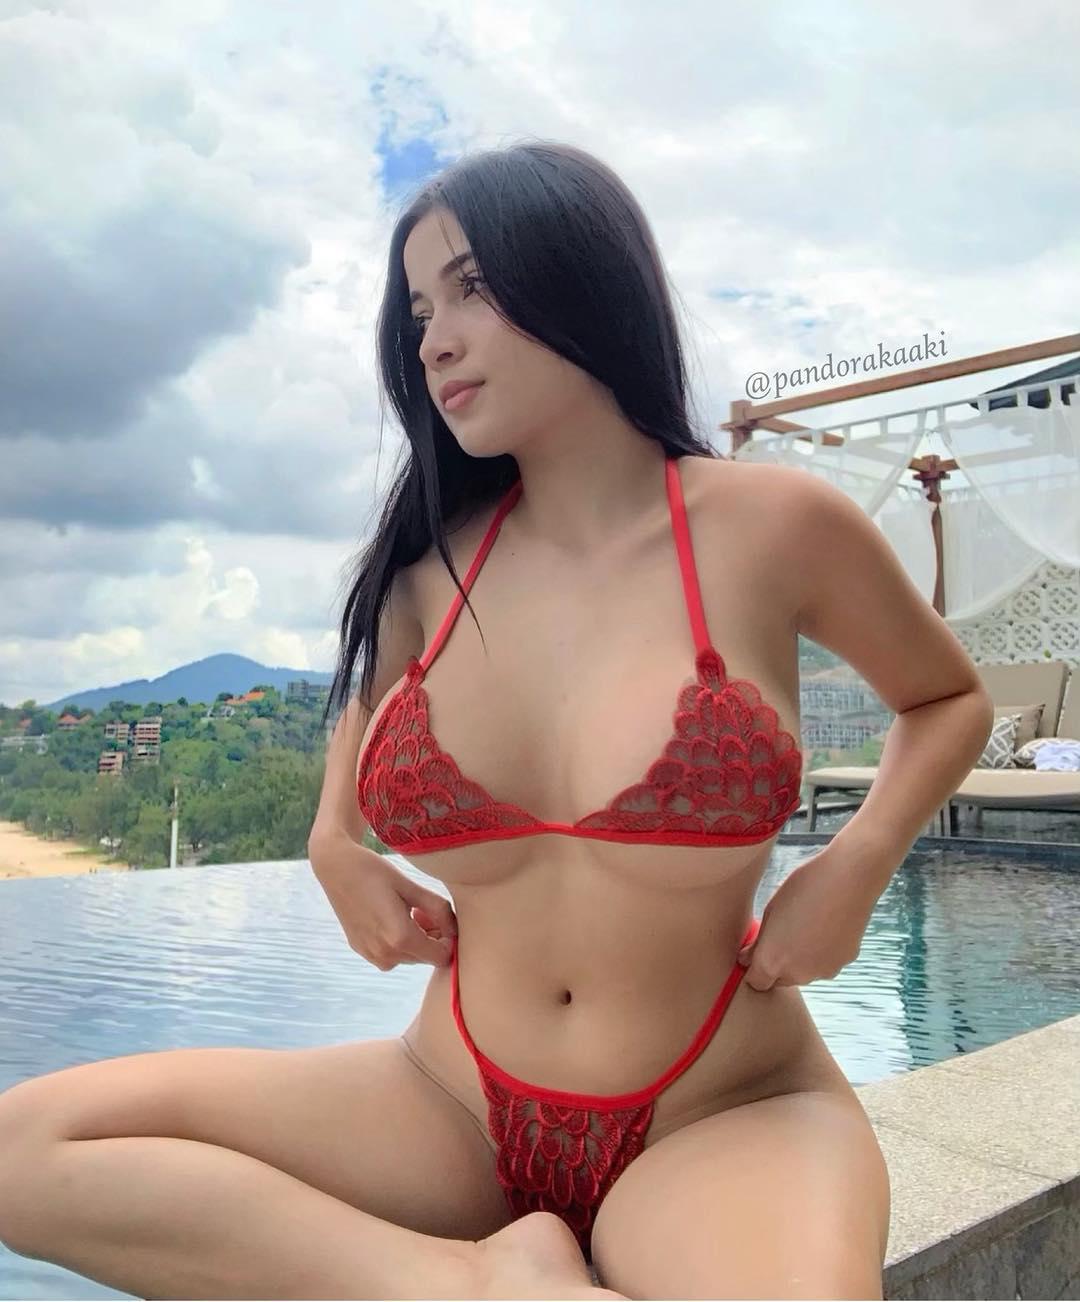 mar-anne almosa bikini pics 01